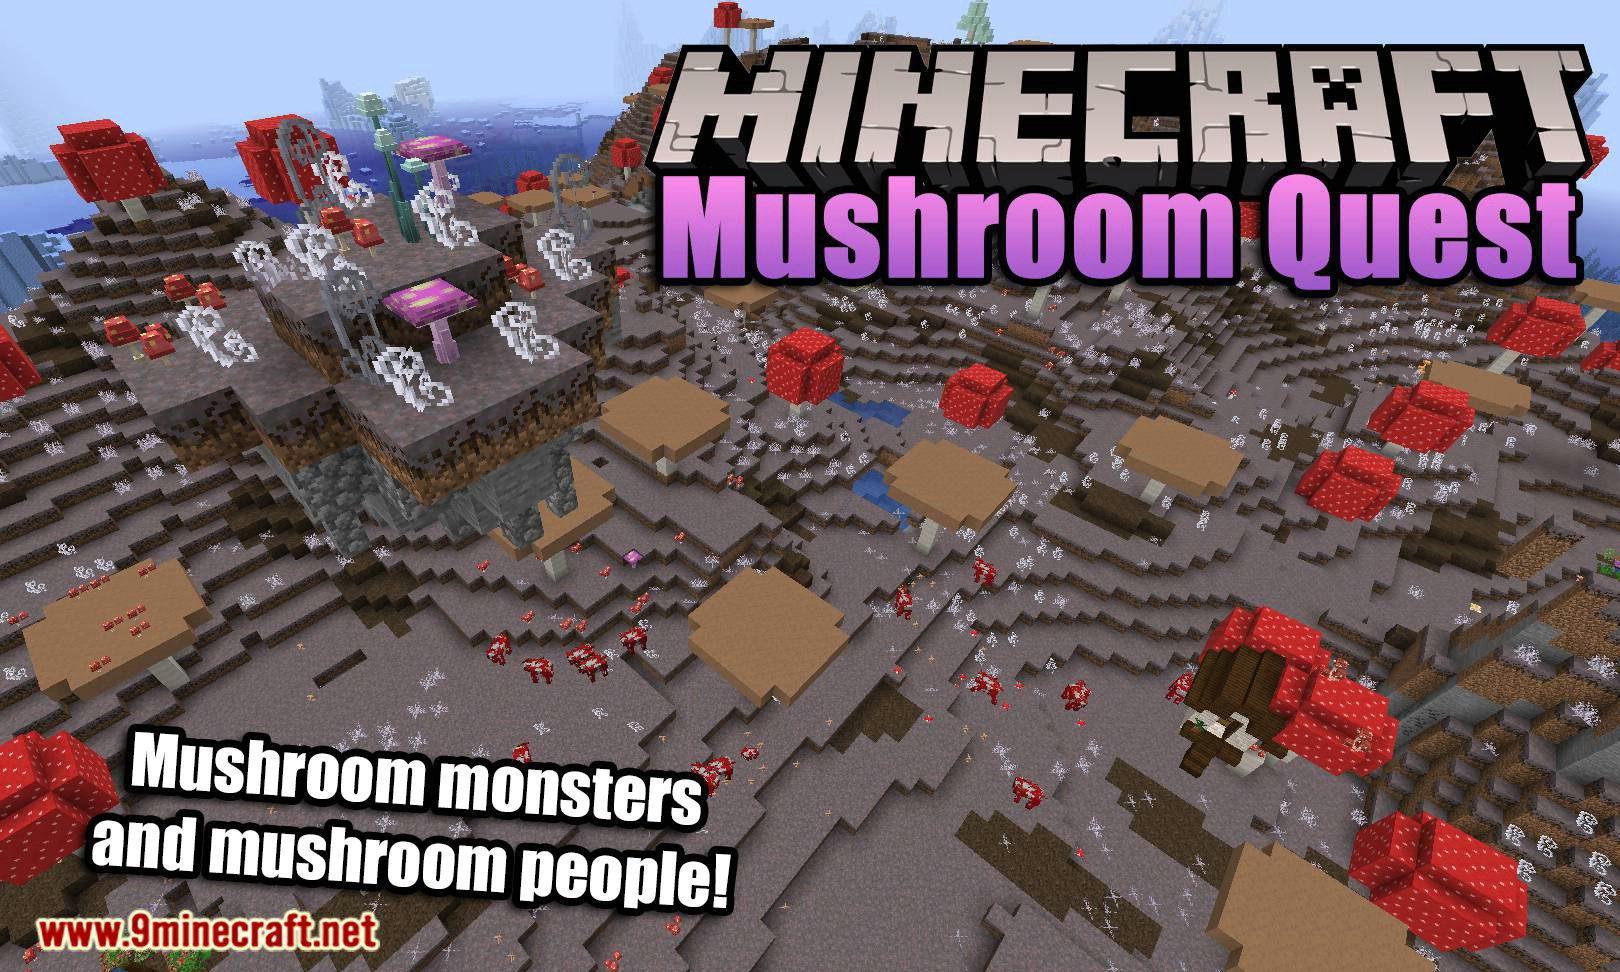 Mushroom Quest mod for minecraft logo